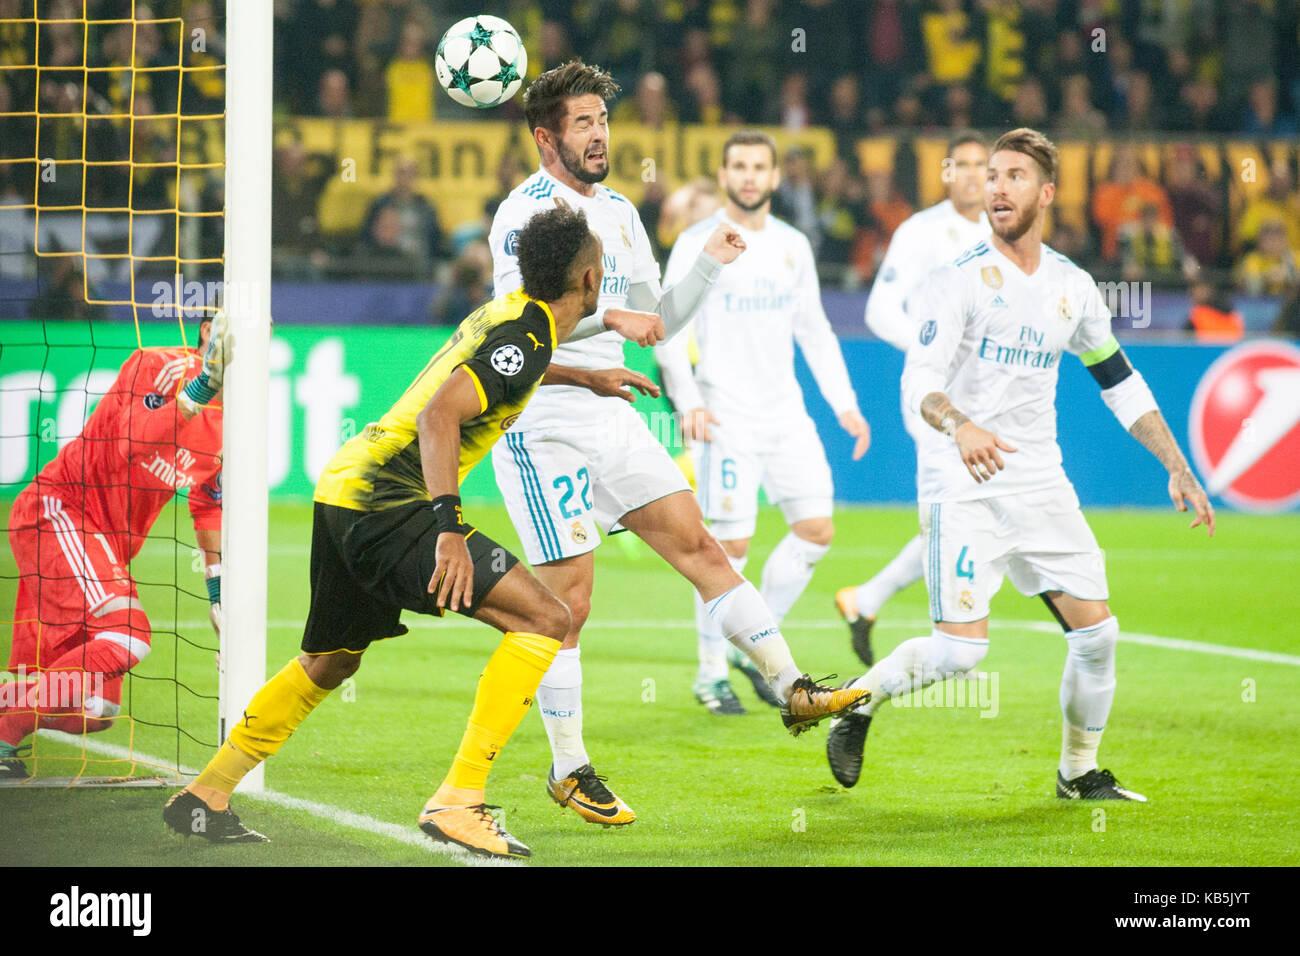 ISCO (mi., Real) rettet vor Pierre-Emerick AUBAMEYANG (DO), Aktion, Kampf um den Ball, Fussball Champions League, - Stock Image